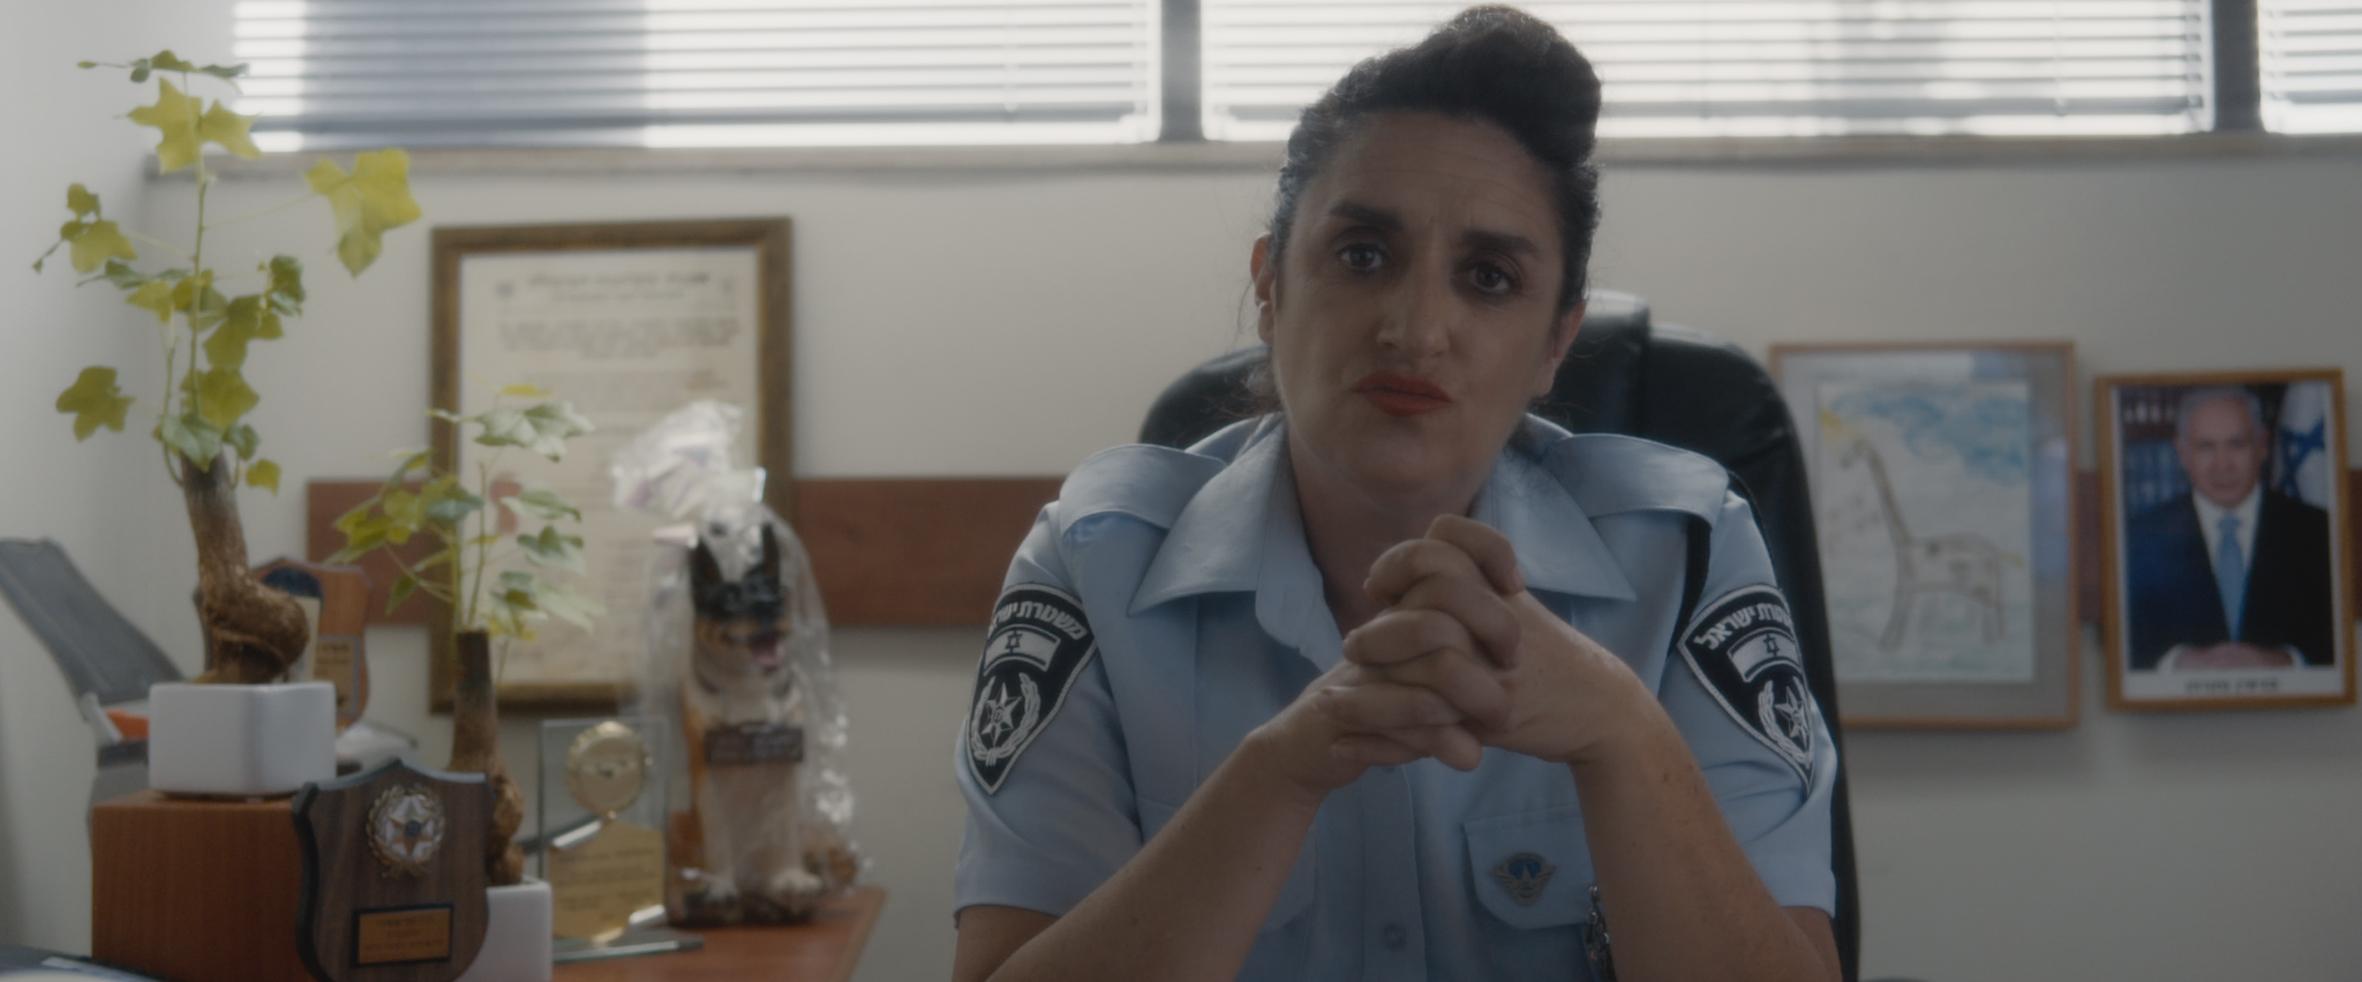 Florence Bloch-Investigator